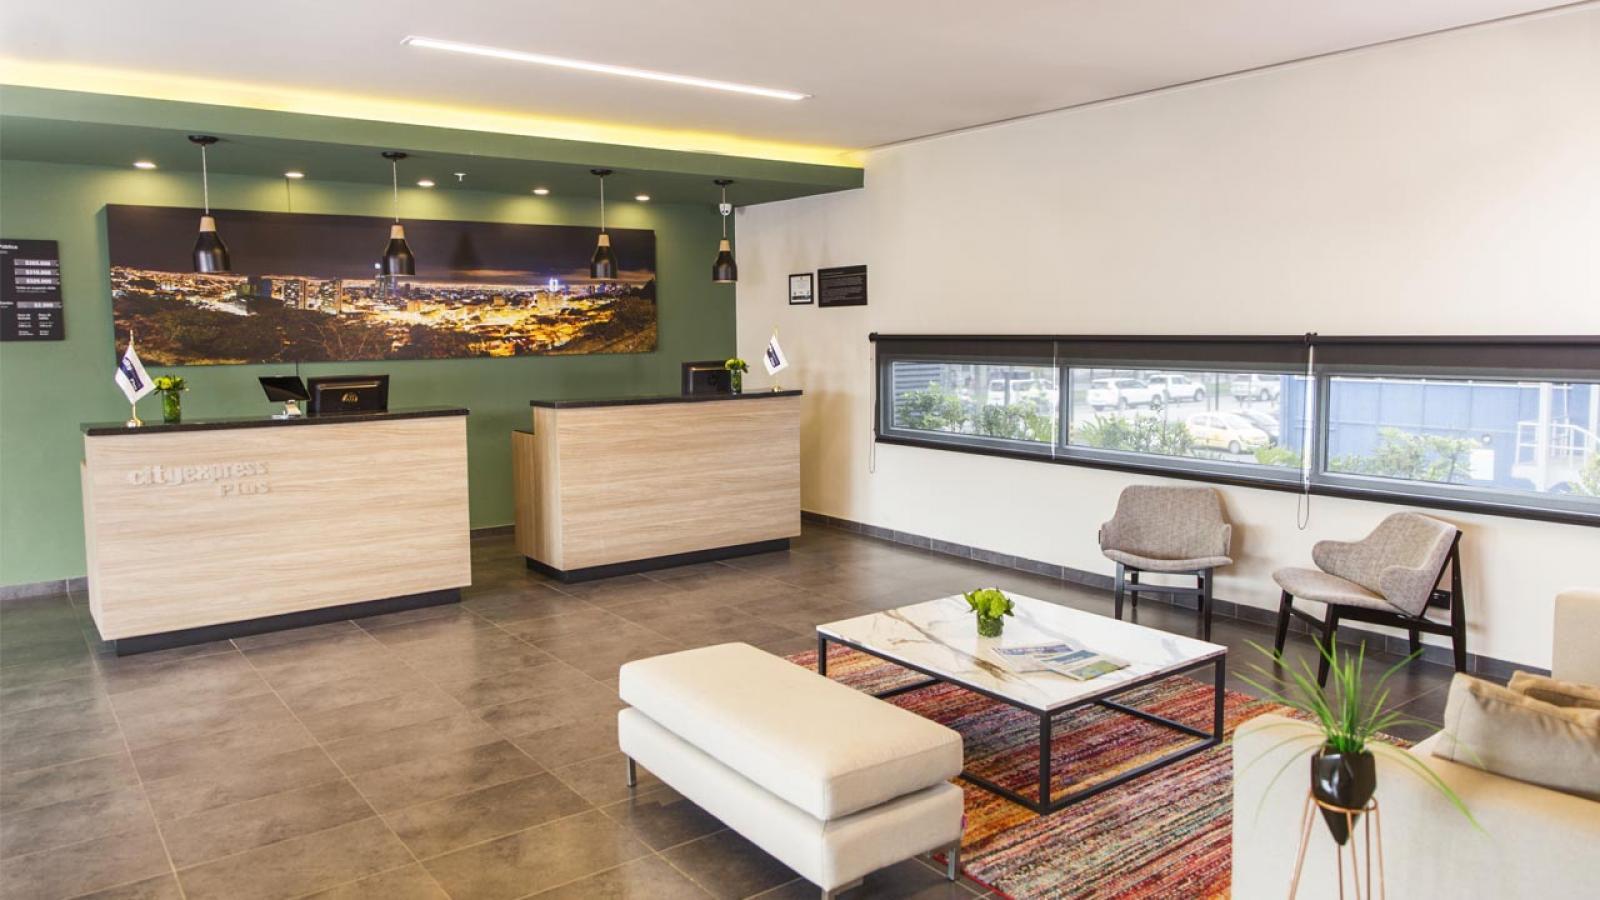 sofa cama bogota colombia 2 seater recliner gumtree city express plus bogotá aeropuerto hoteles